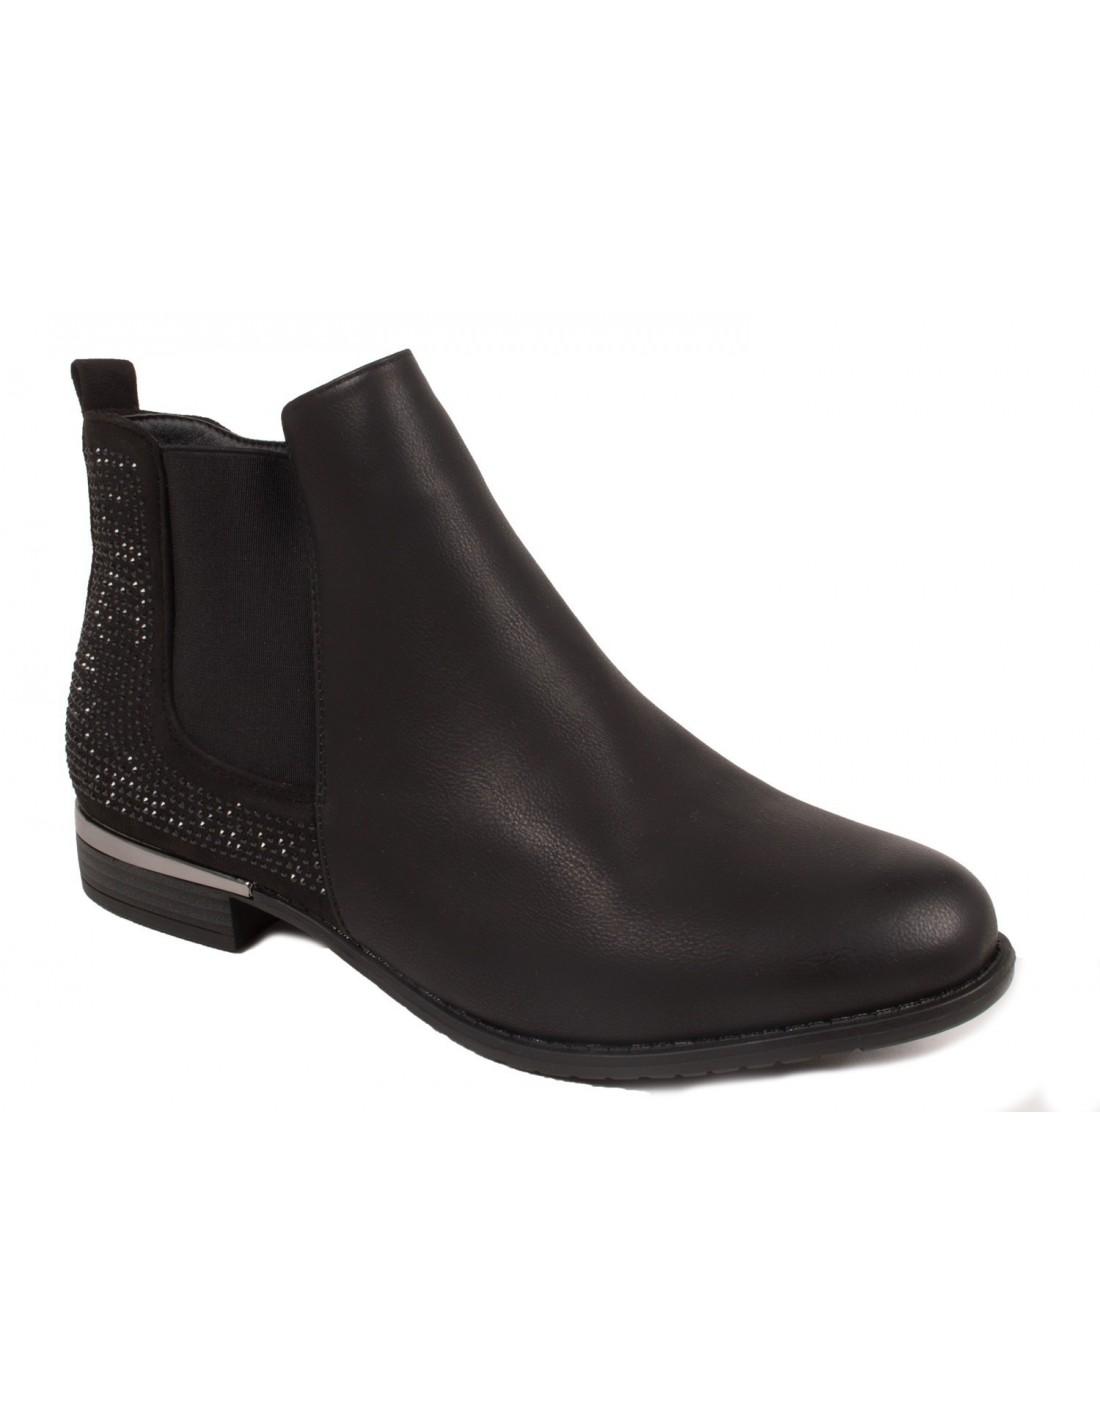 Pas 41 45 Chaussures Cher Primtex À Pointure Femme Taille D9IH2WE